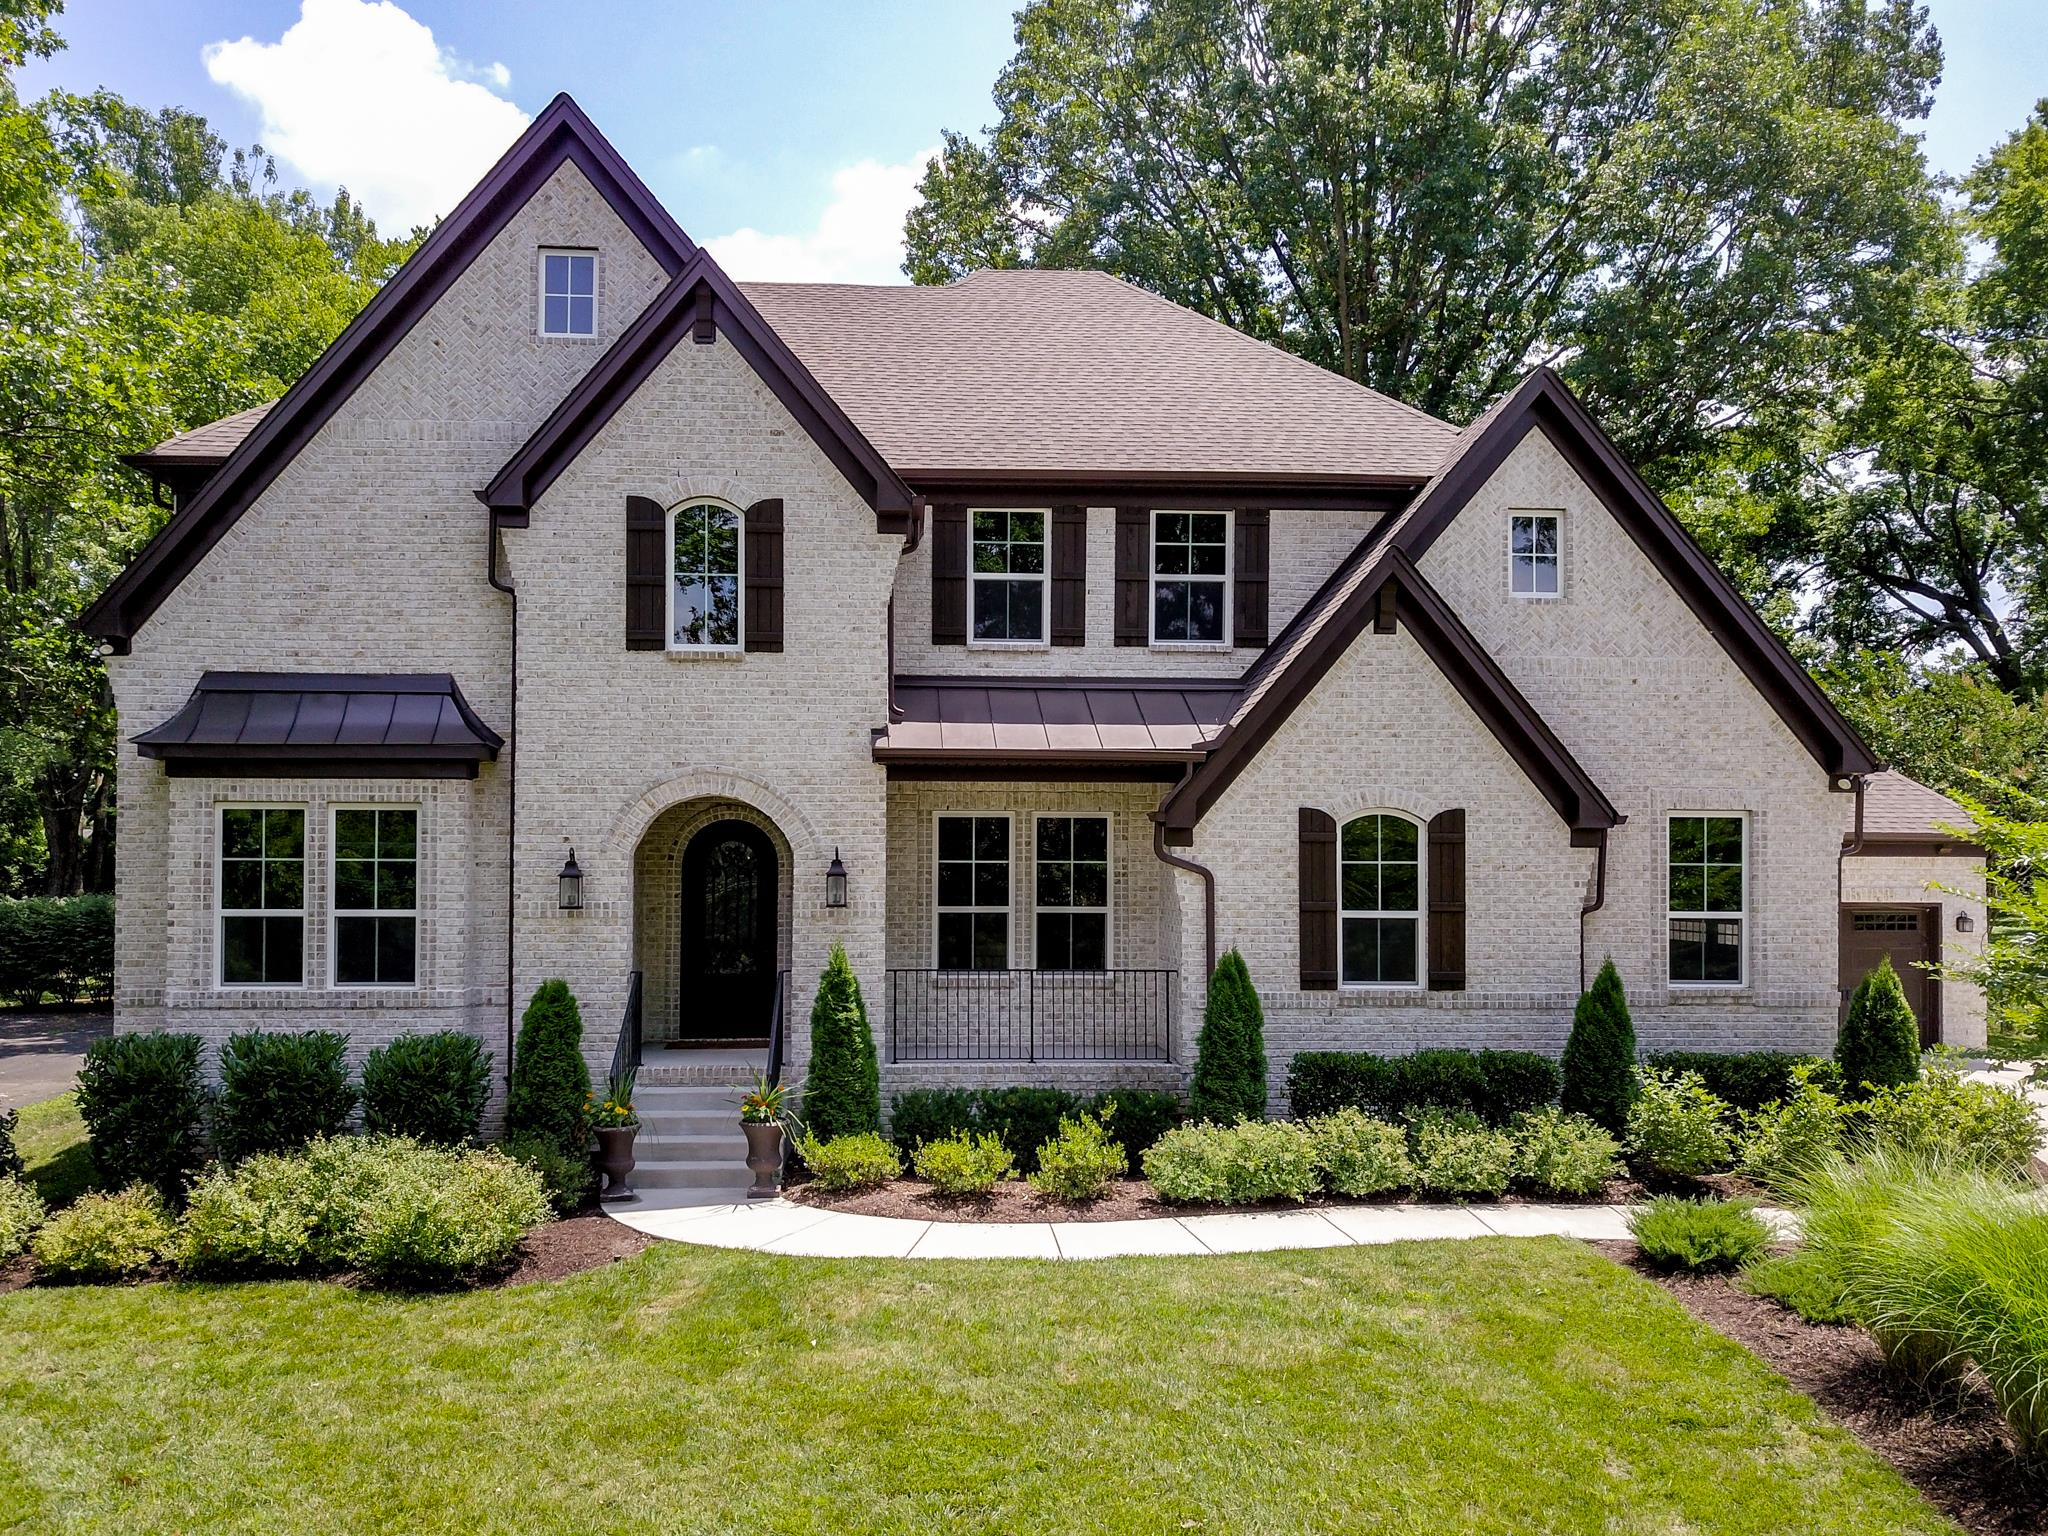 4028 Lealand Ln, Nashville, TN 37204 - Nashville, TN real estate listing